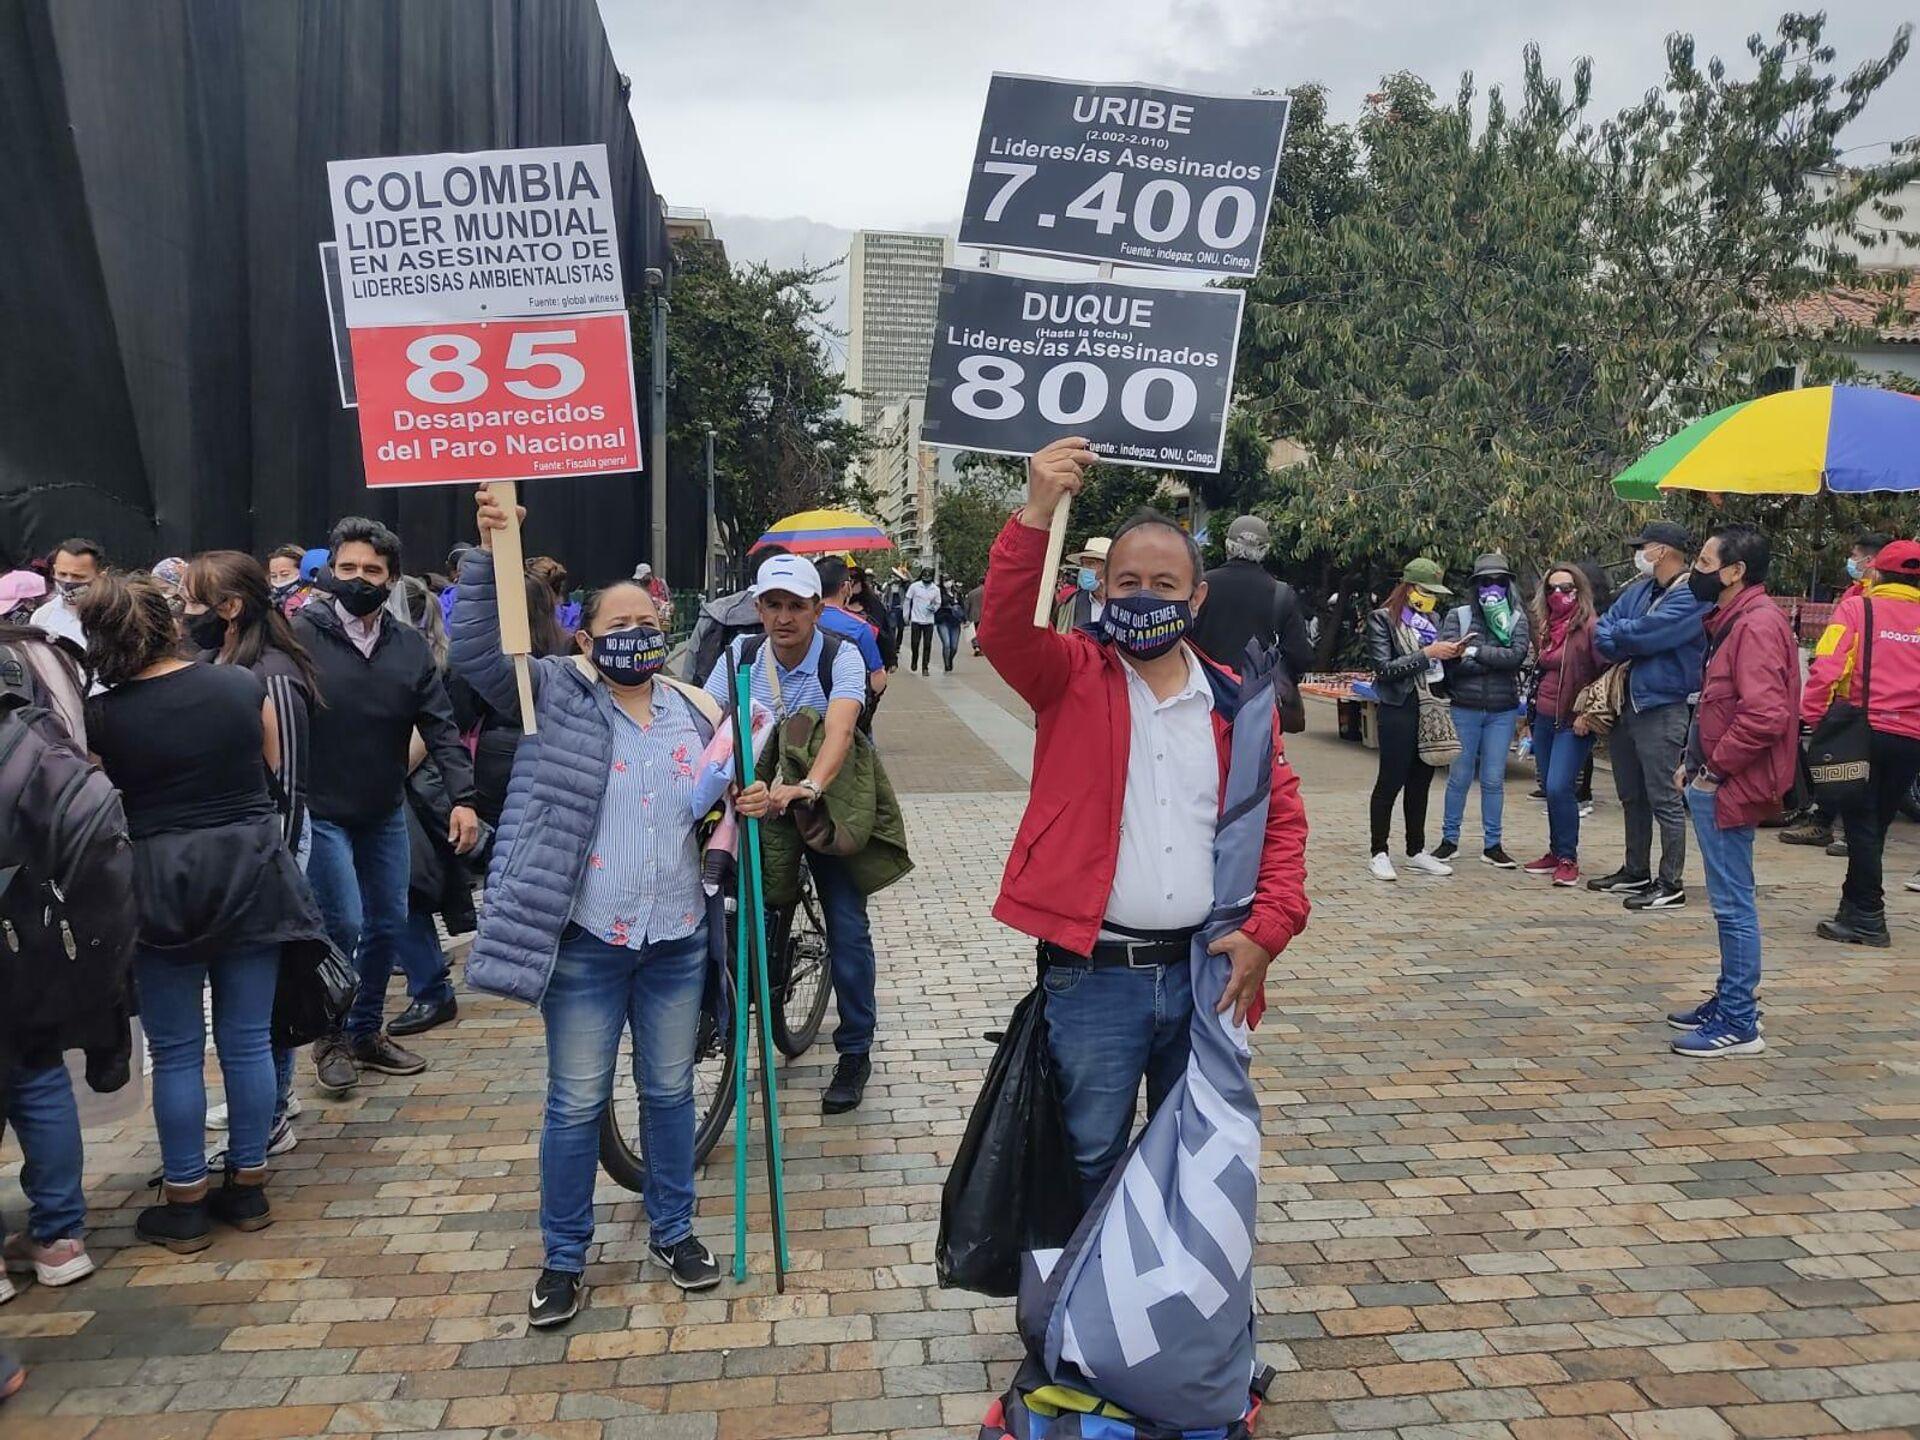 La marcha en Bogotá, Colombia - Sputnik Mundo, 1920, 29.09.2021